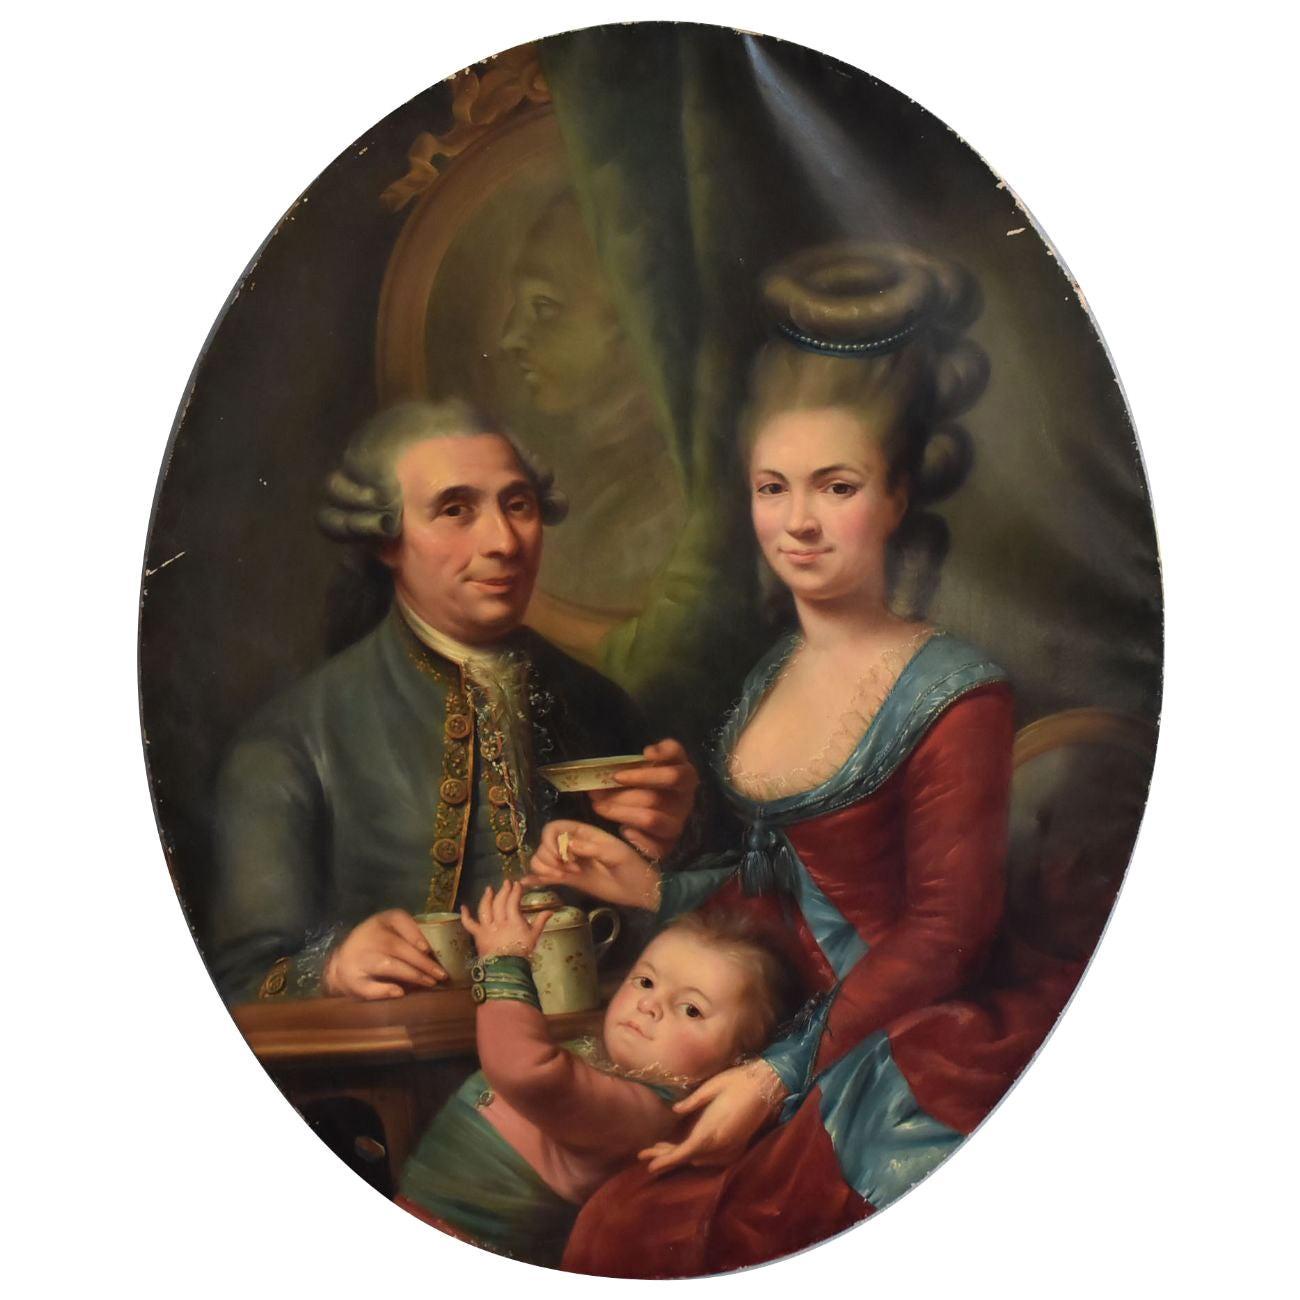 19th Century Medallion Painting Family Portrait